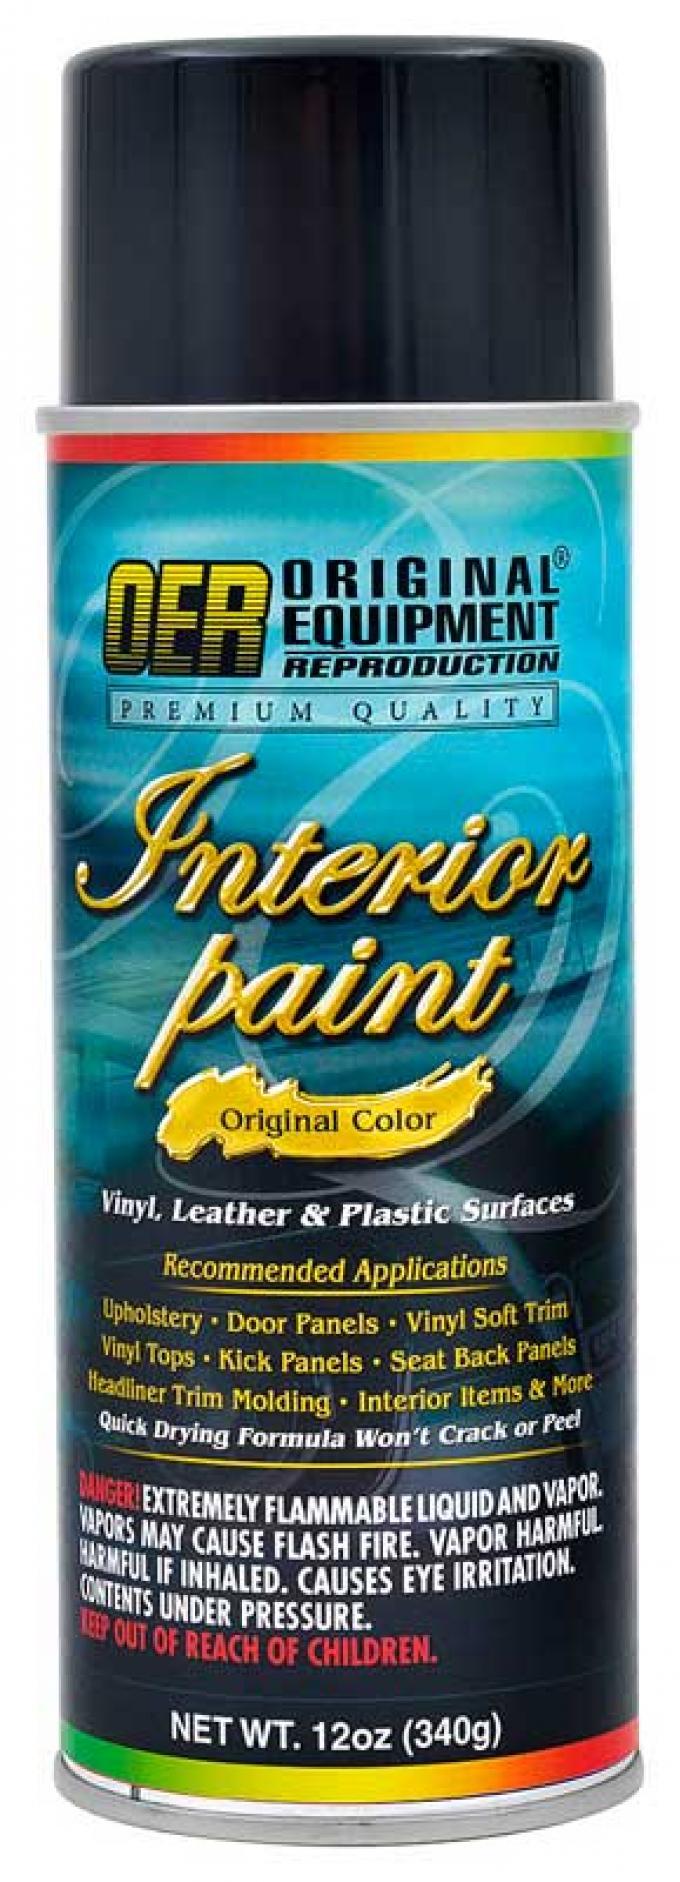 OER 1969 Mustang Dark Ivy Metallic Color Coat Spray 12 Oz. Aerosol Can PP927